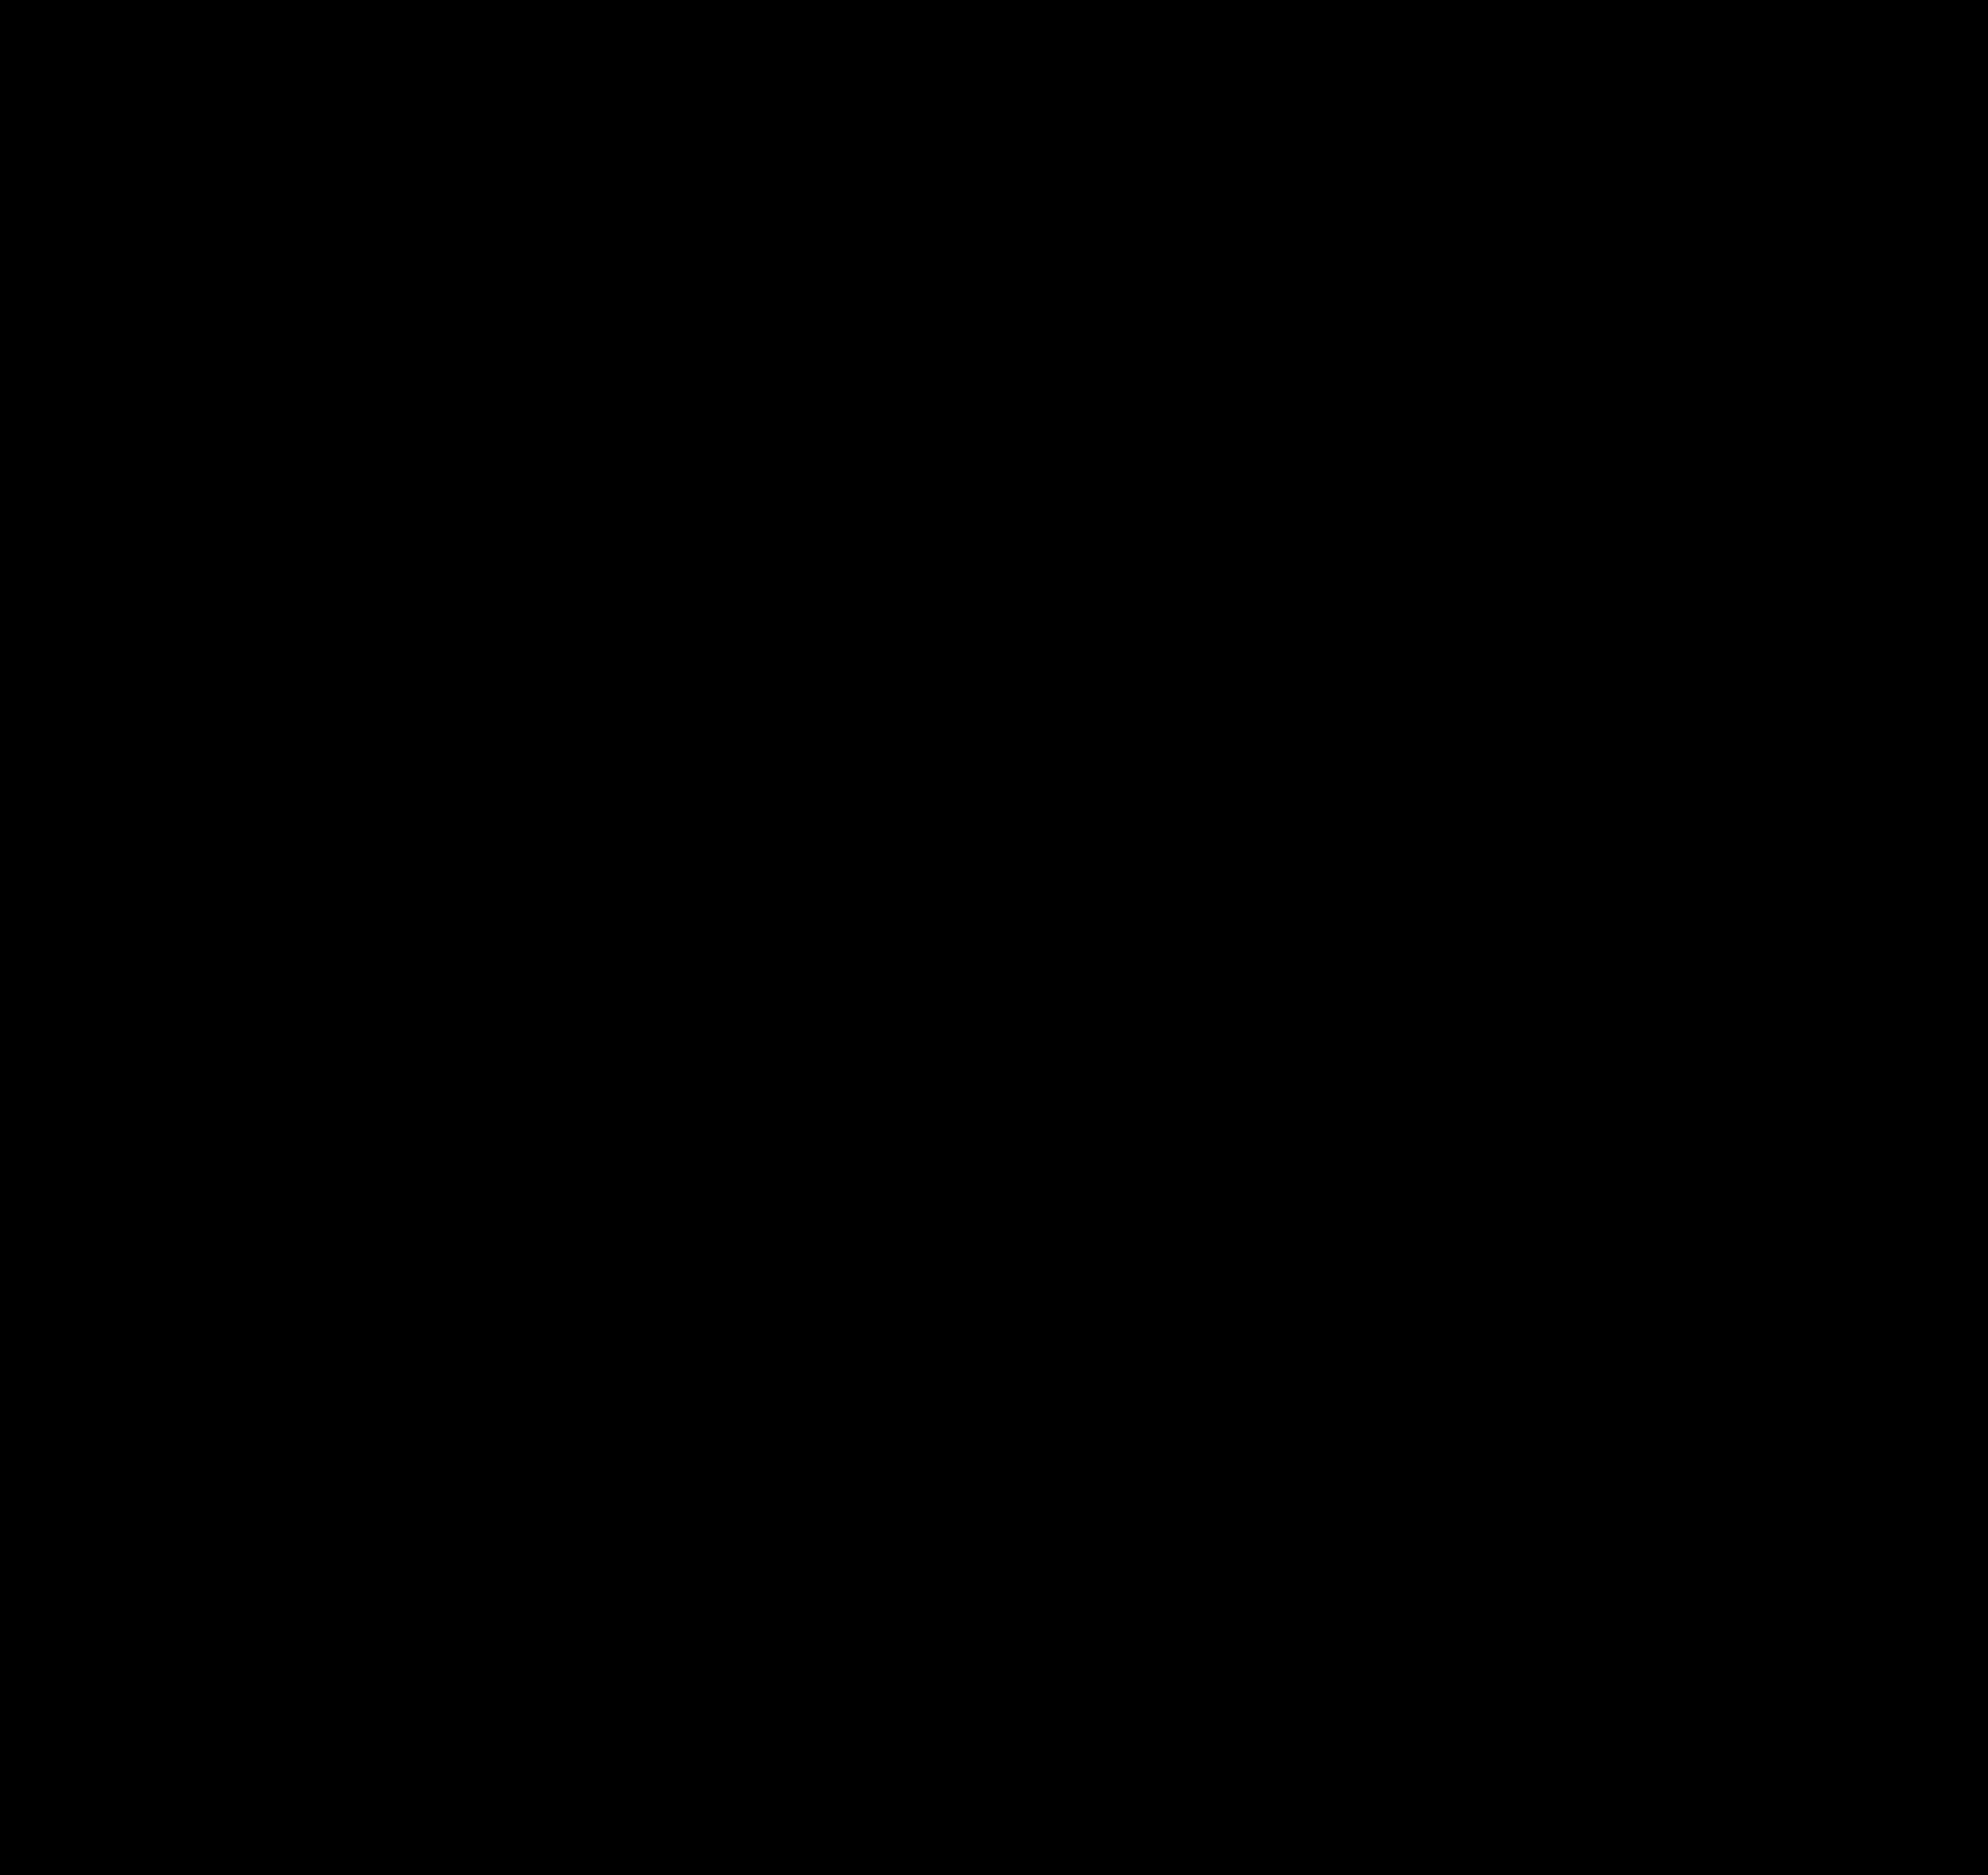 СССР логотип PNG